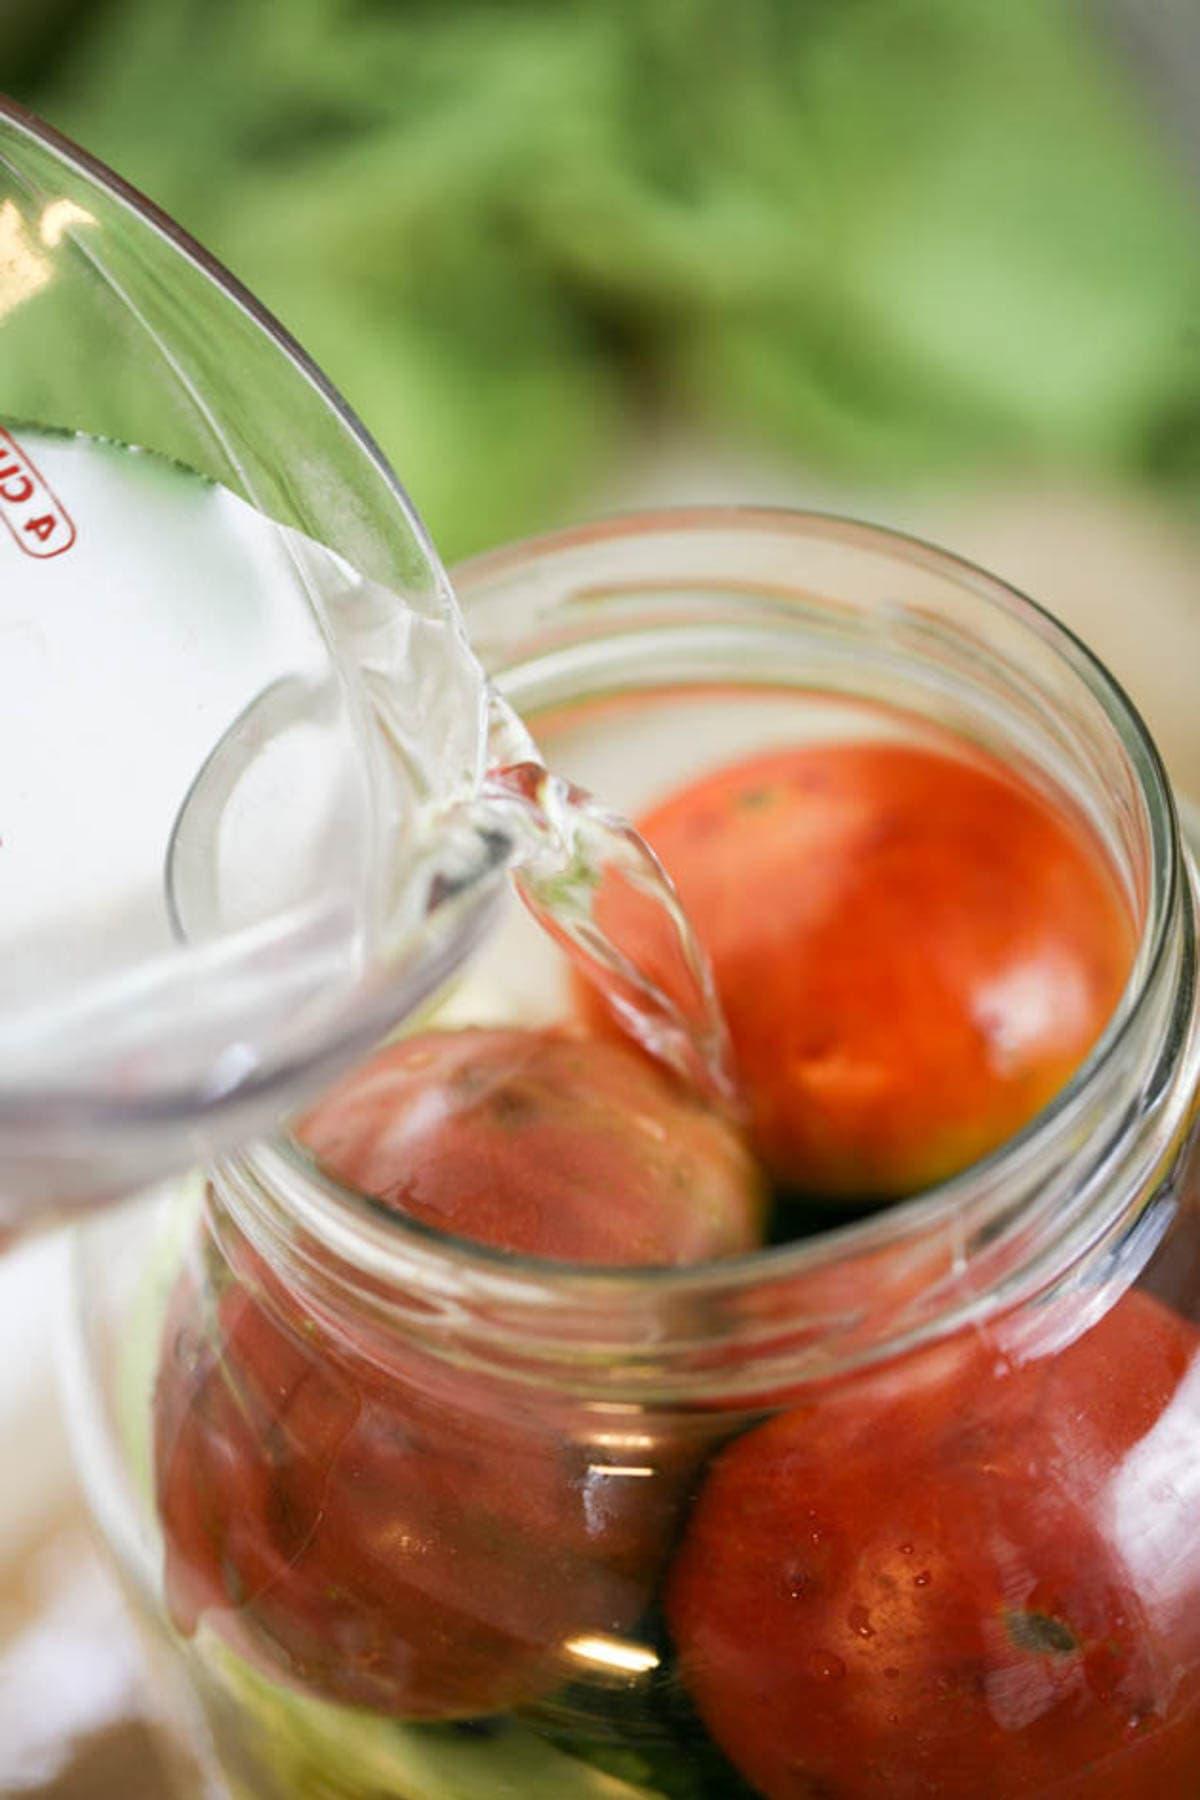 Adding brine to the jar.